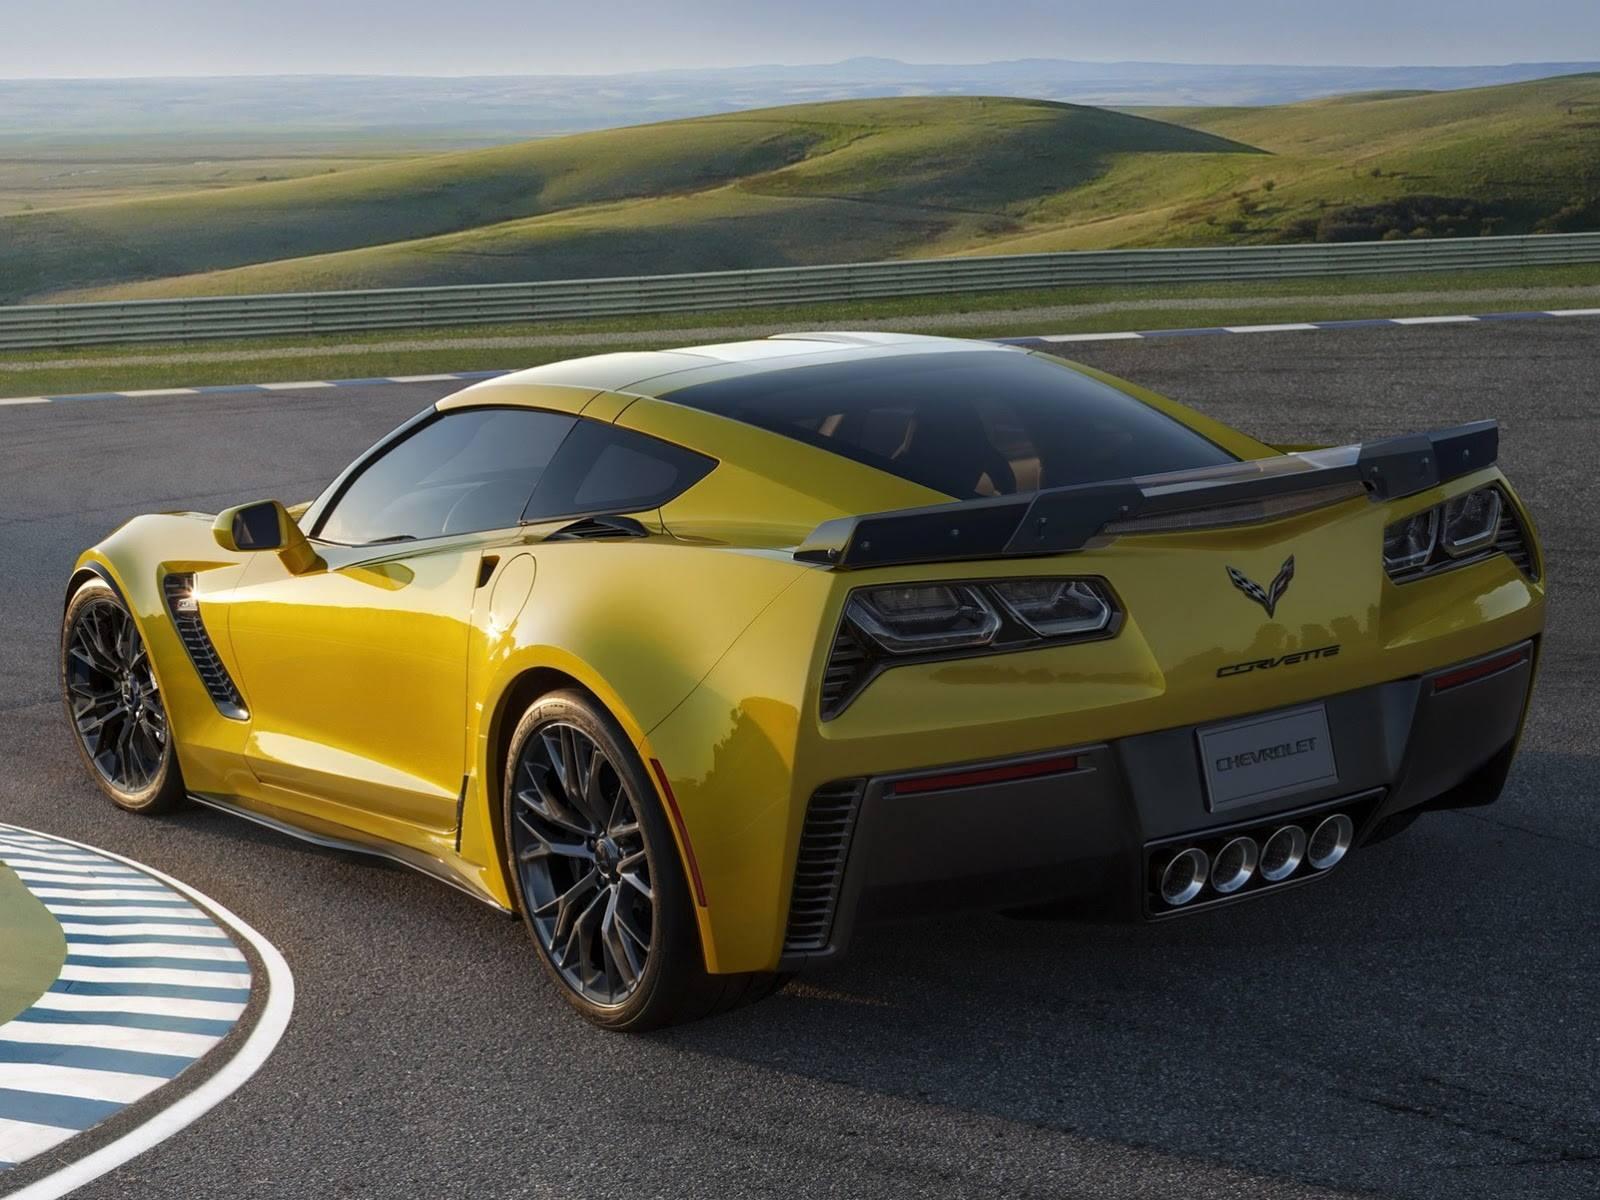 2015 corvette z06 unleashed w 625 horsepower at 2014 naias. Black Bedroom Furniture Sets. Home Design Ideas